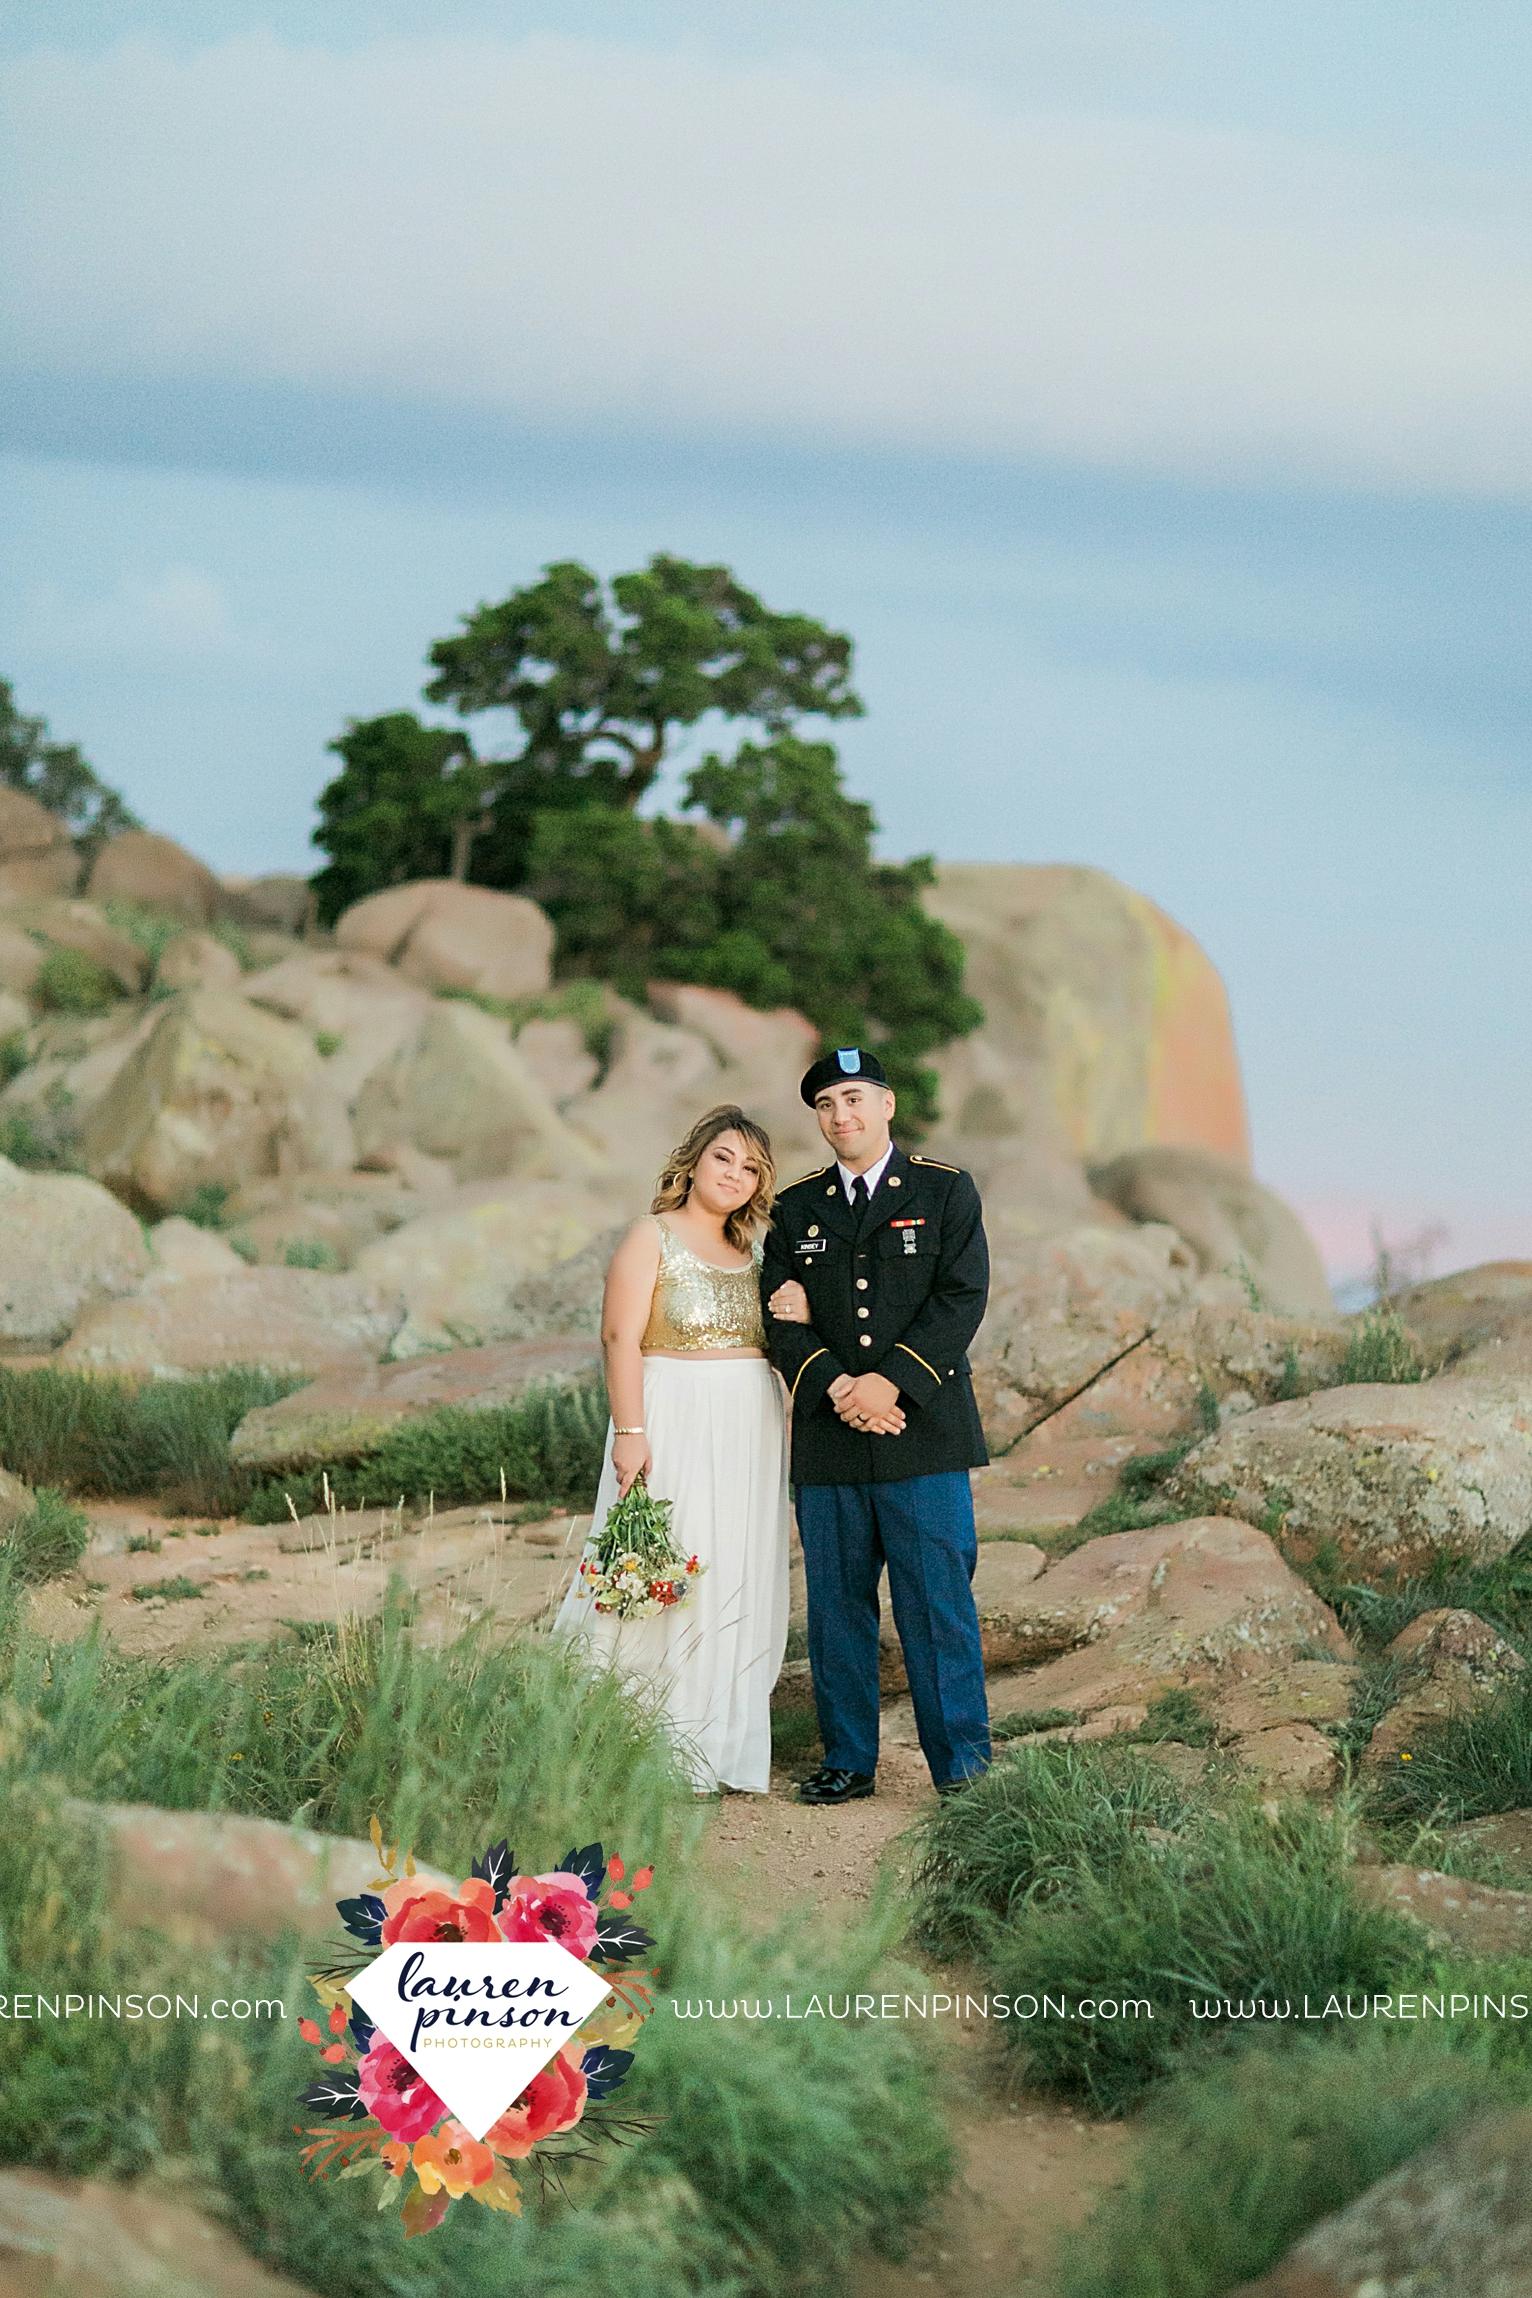 wichita-falls-texas-wedding-photography-engagement-session-army-fort-sill-lawton-oklahoma-wichita-mountains-newlyweds-00014.jpg